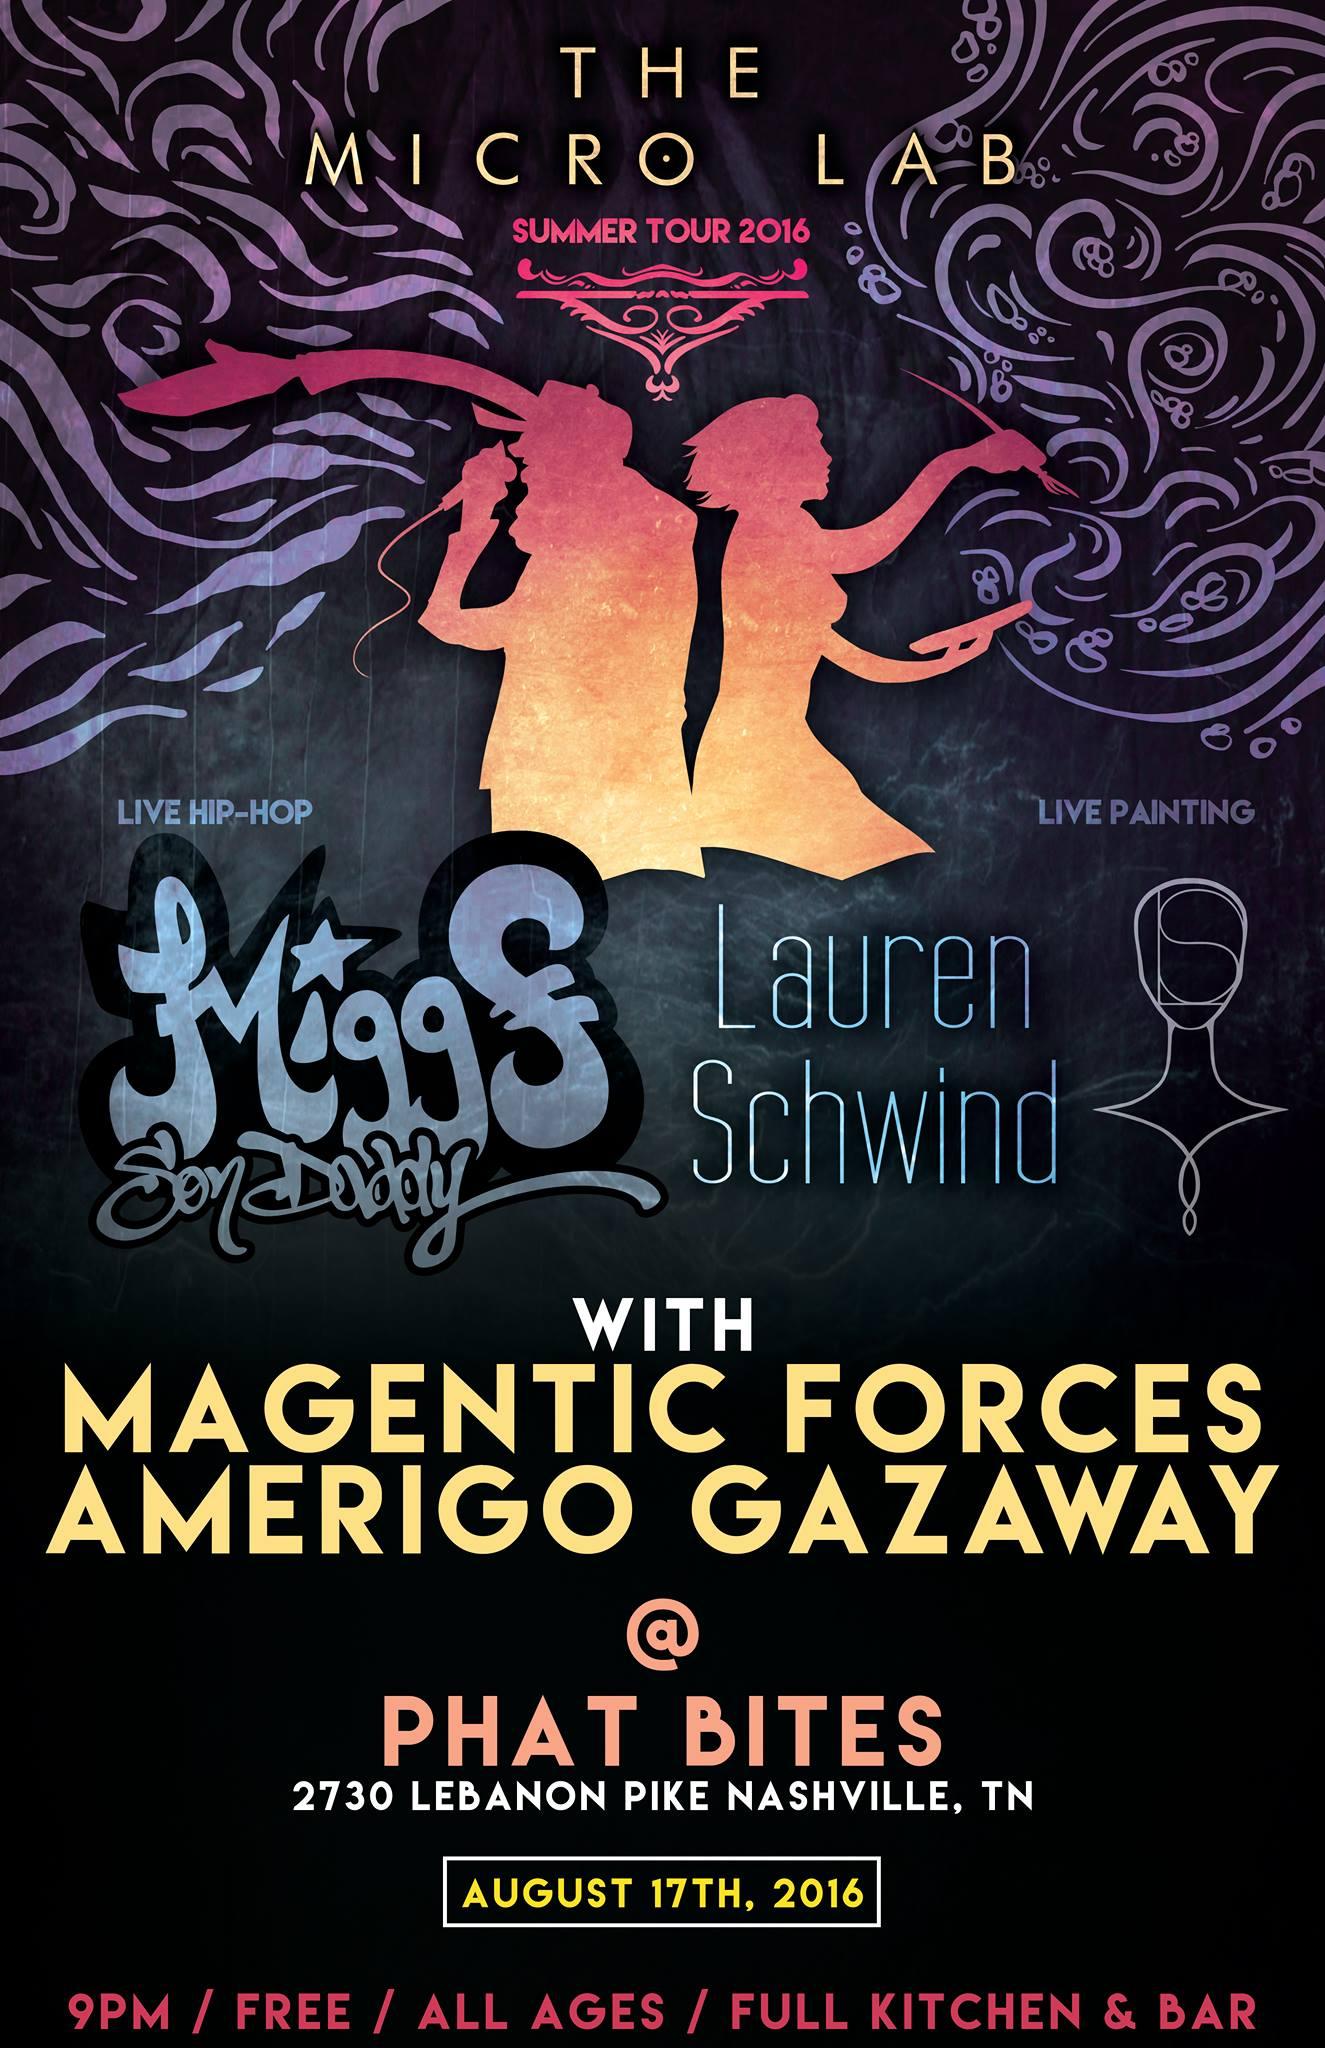 The Micro Lab Tour w/ Magnetic Forces & Amerigo Gazaway at Phat Bites